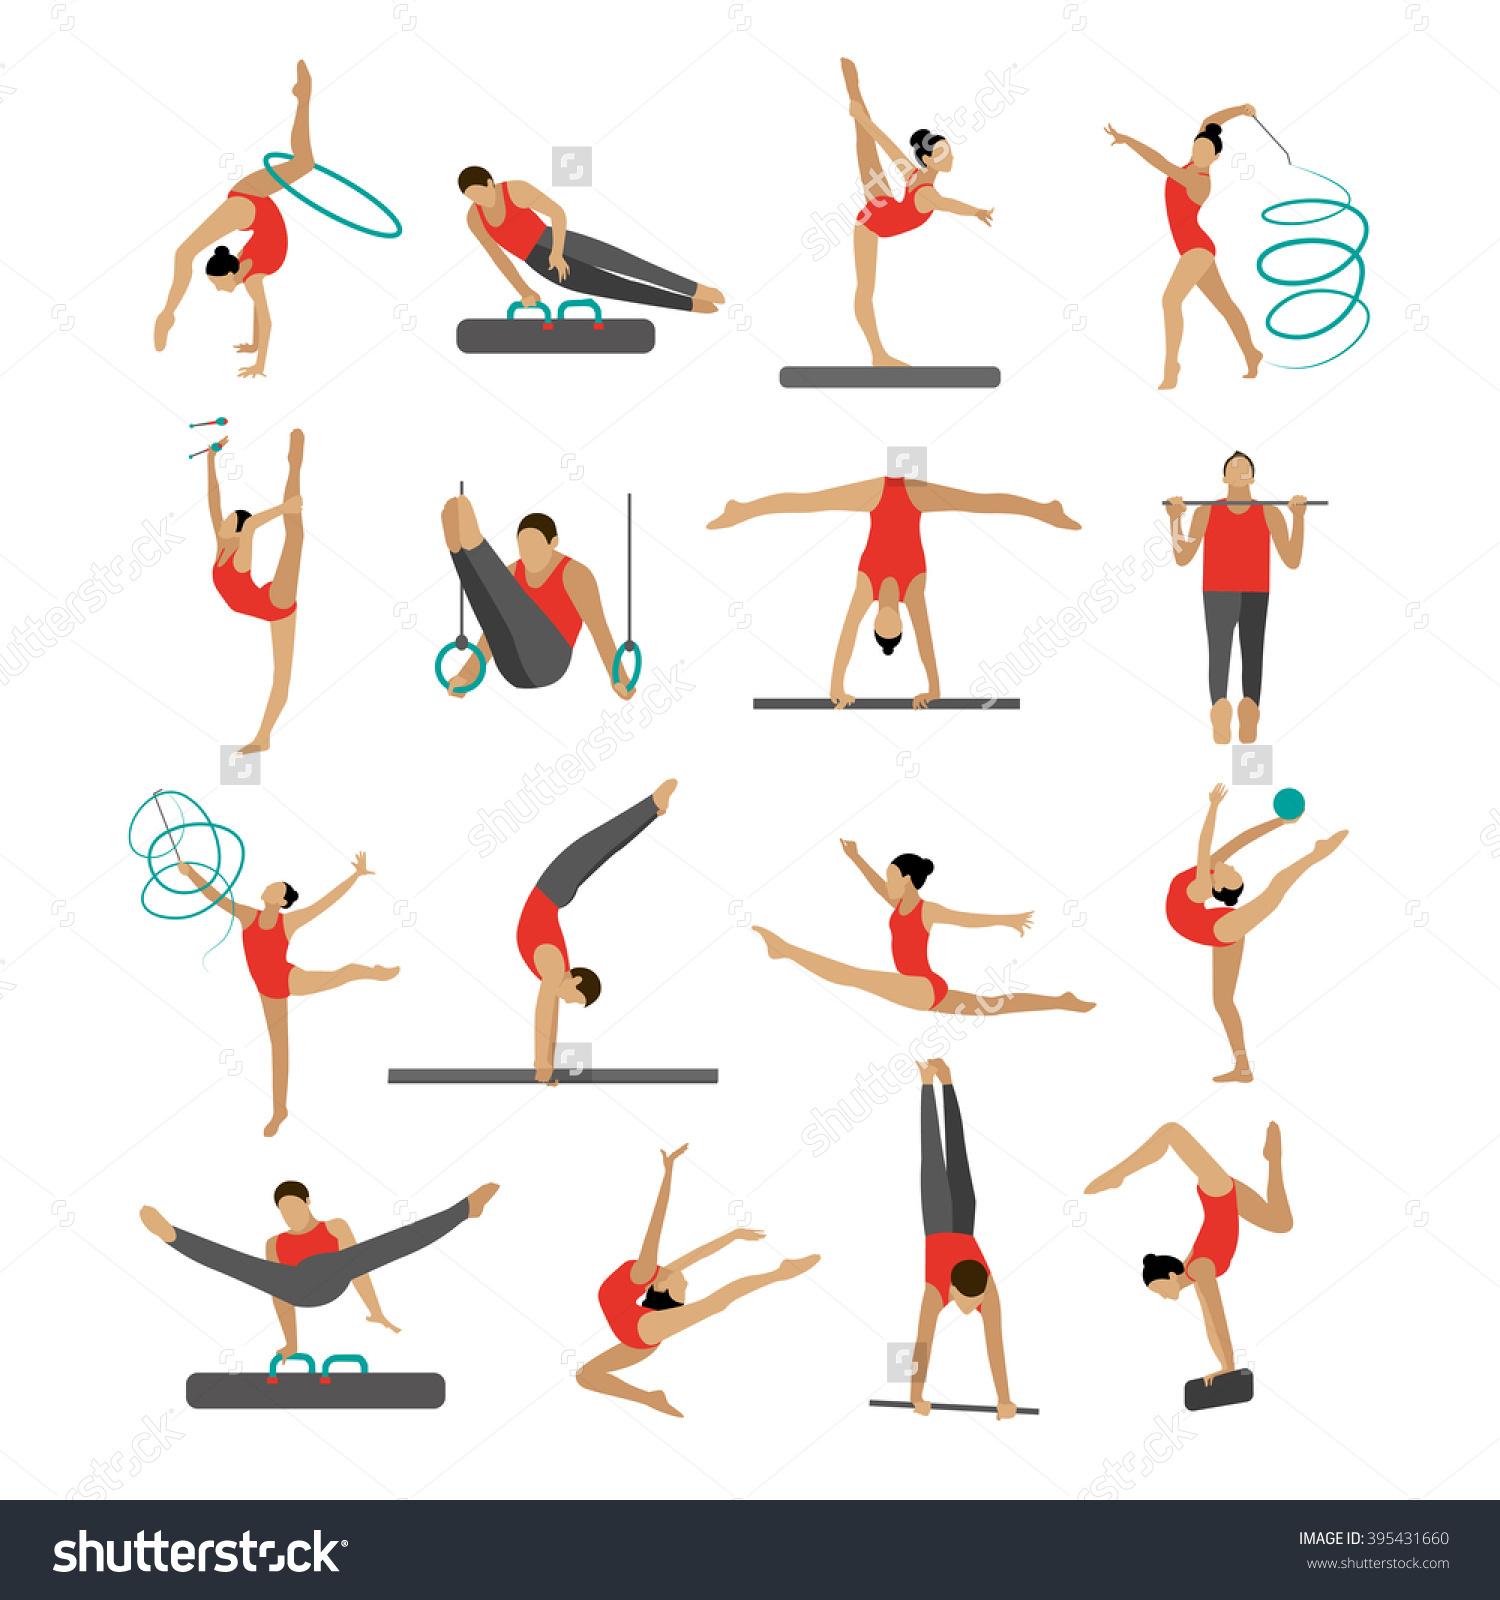 Gymnast clipart gymnastics moves \x3cb\x3egymnast\x3c/b\x3e Clipart Clipart gymnastics Moves